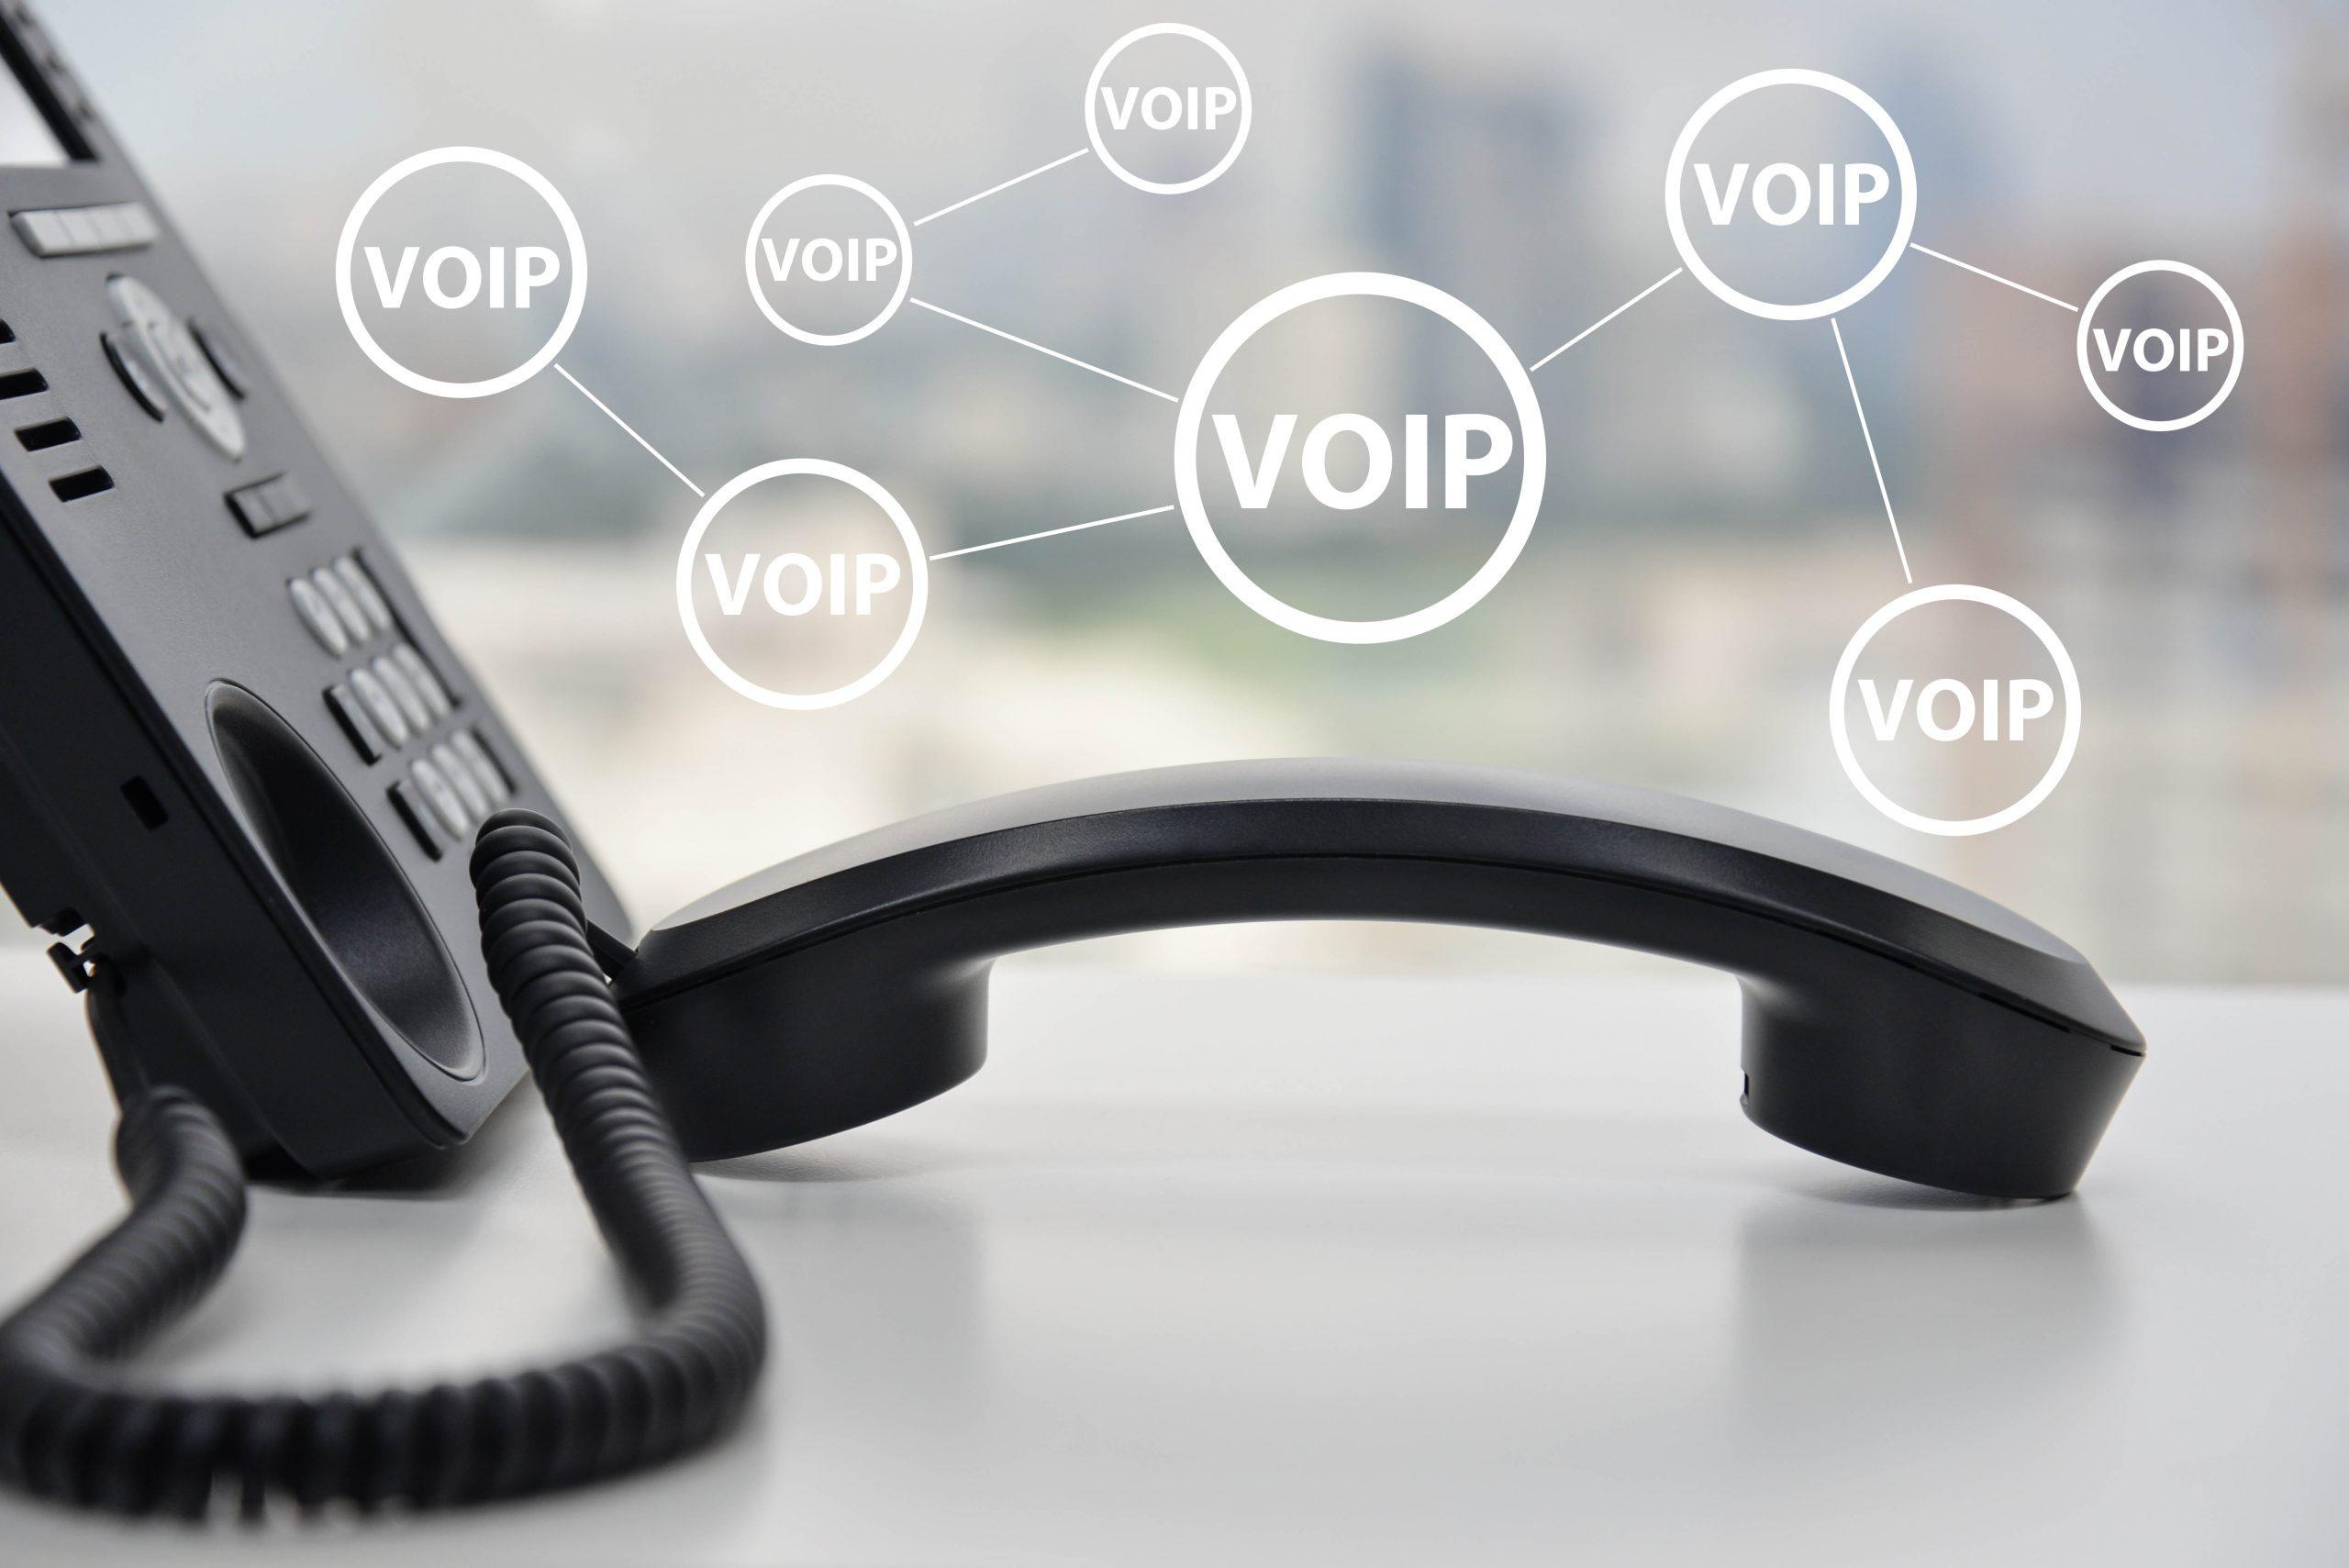 VOIP on desk, Voip diagram